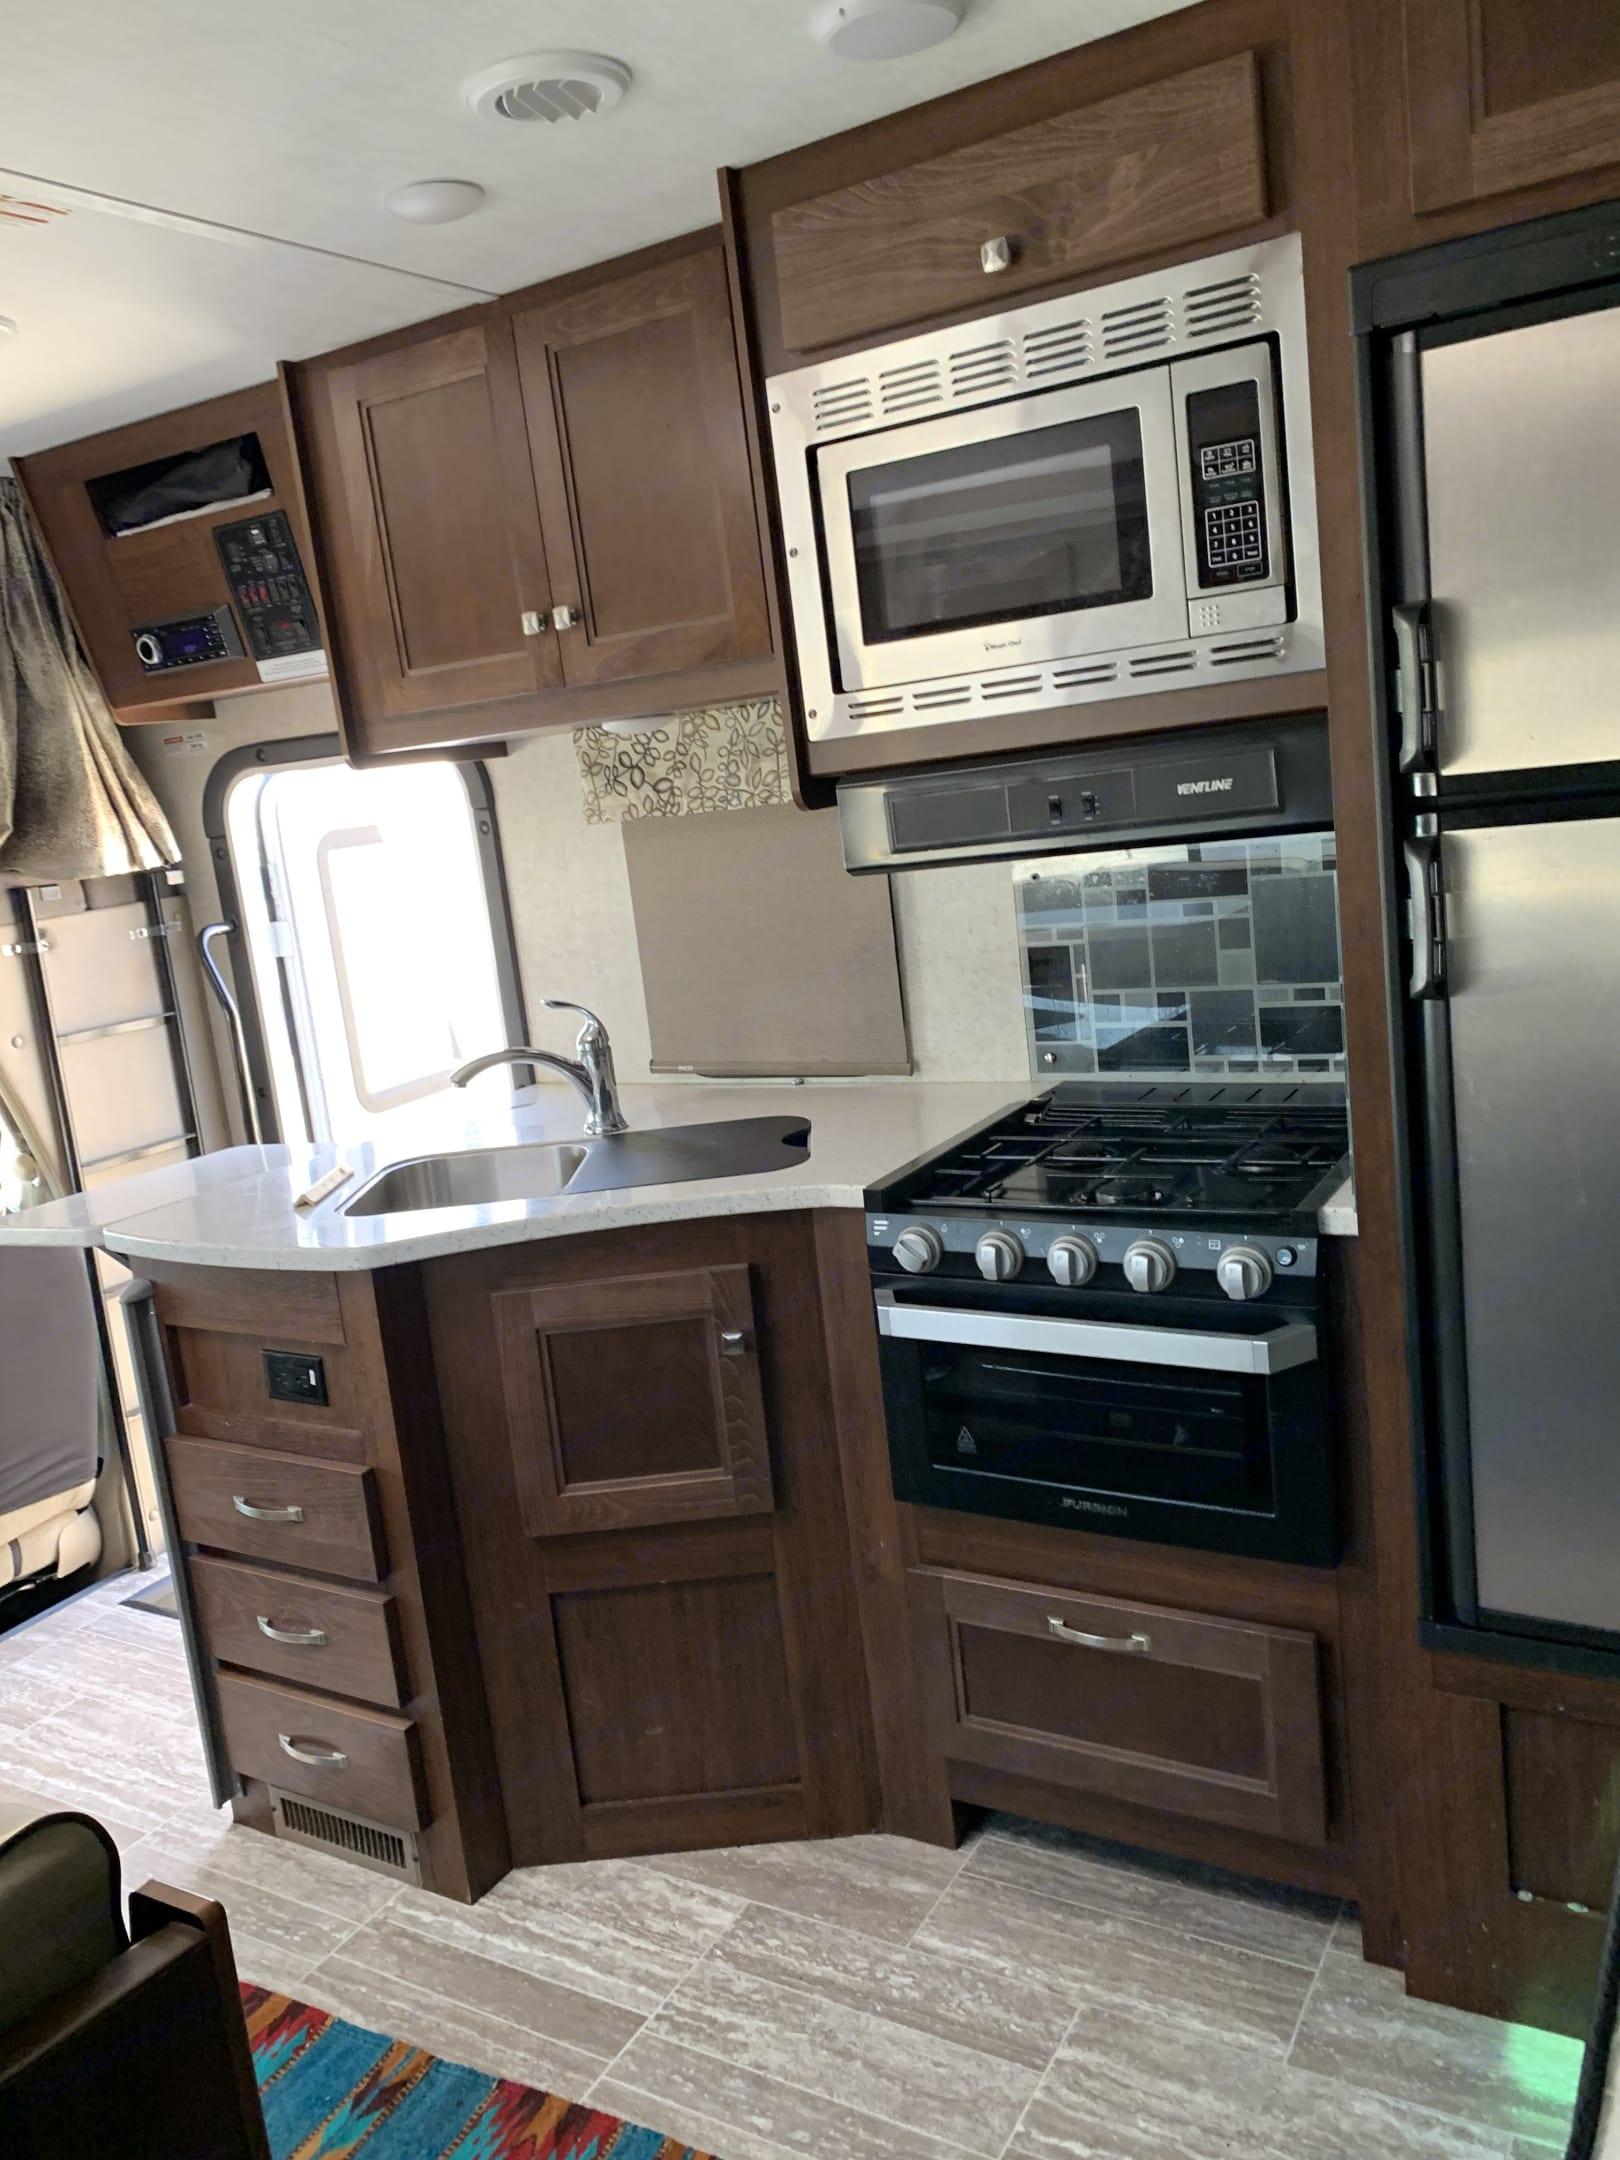 # Burner Stove, Microwave and Large fridge. Forest River Forester 2020